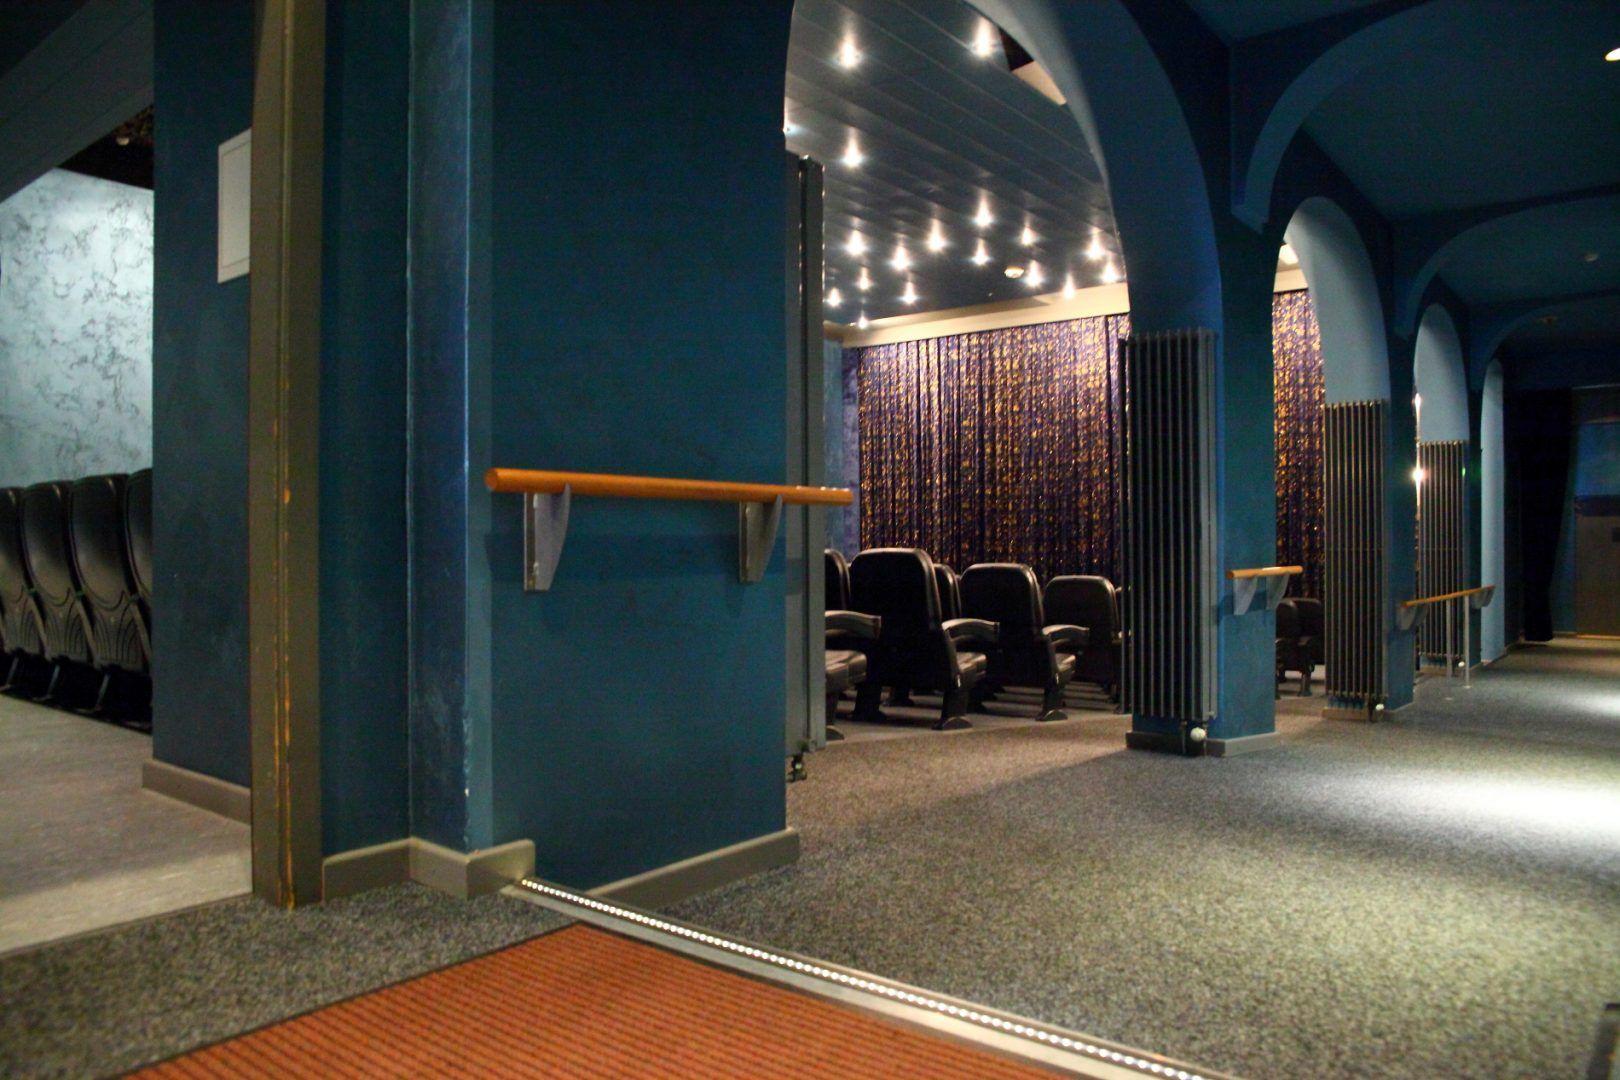 Blauer Stern Kino Berlin